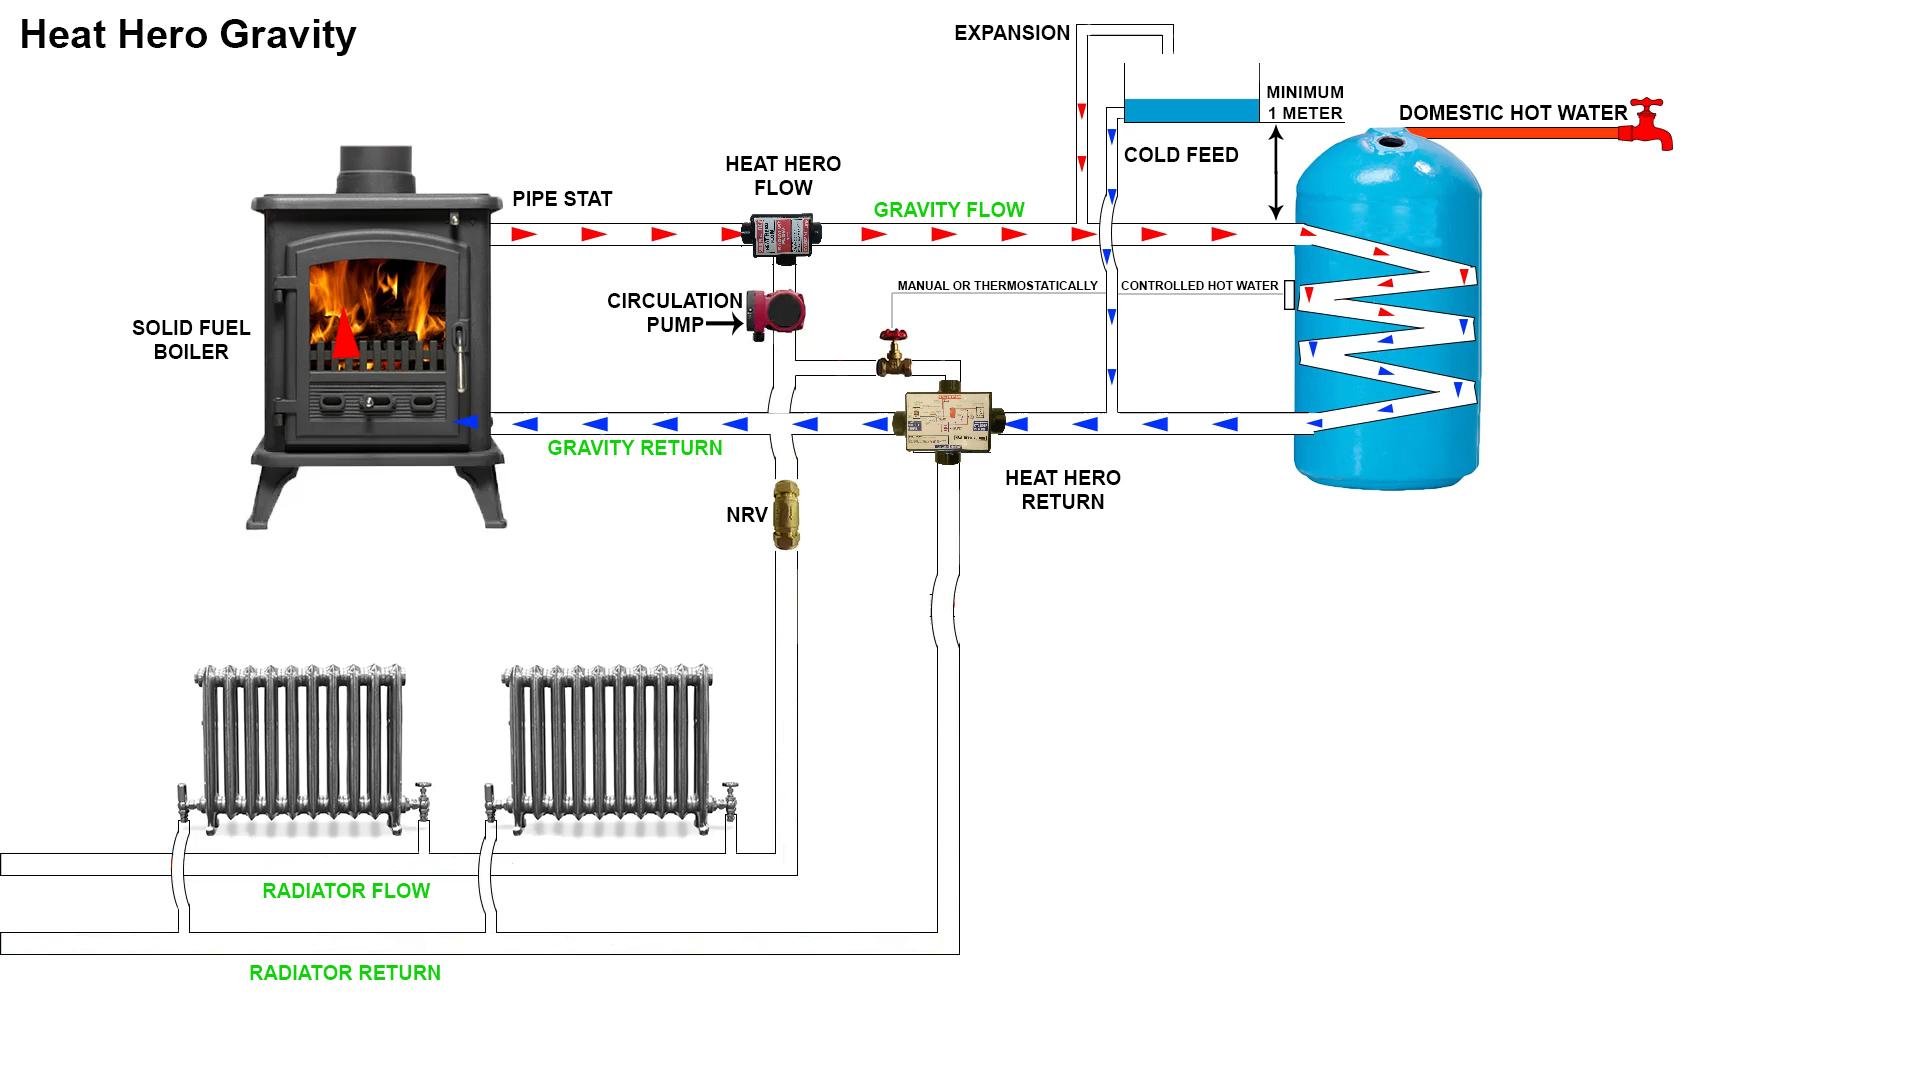 gravity hot water wiring diagram rat biceps femoris heat hero working on only heathero ie